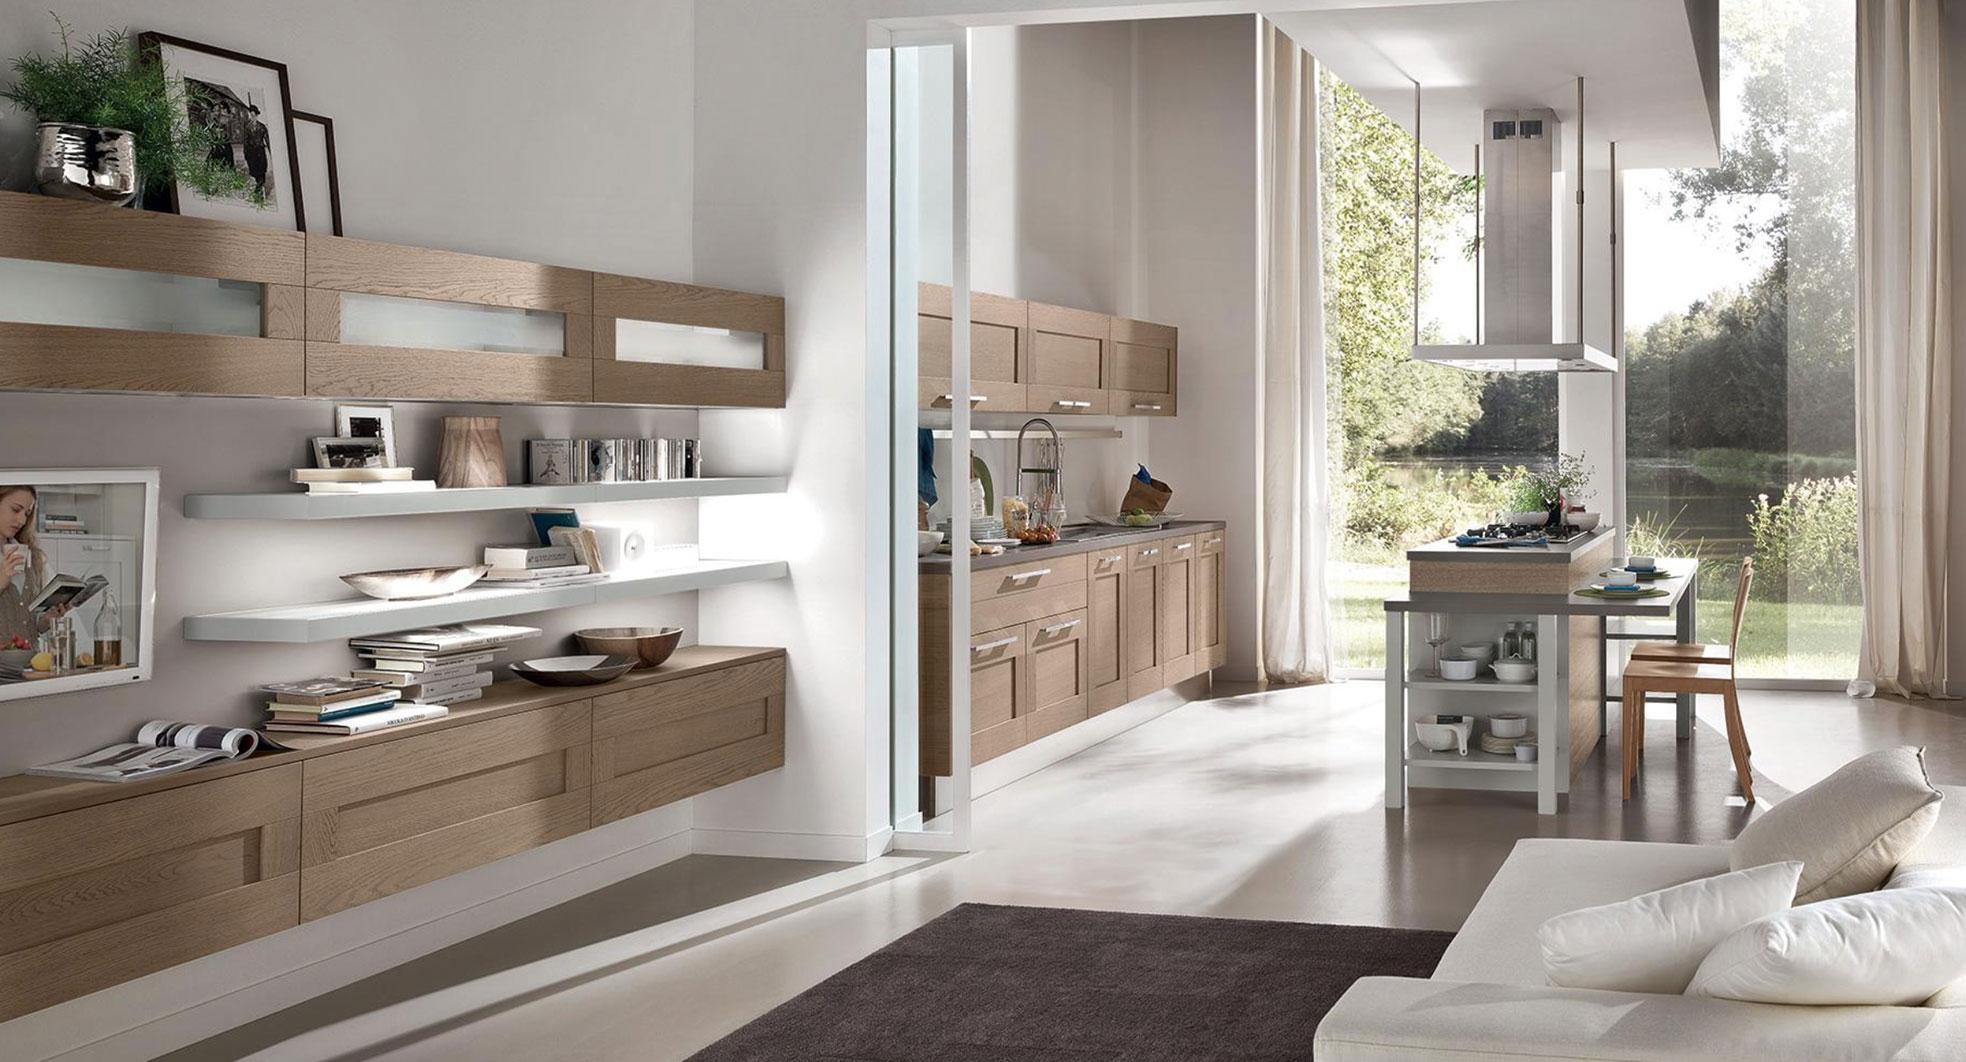 Cucine Open Space Moderne dividere cucina e living in un open space: 5 suggerimenti